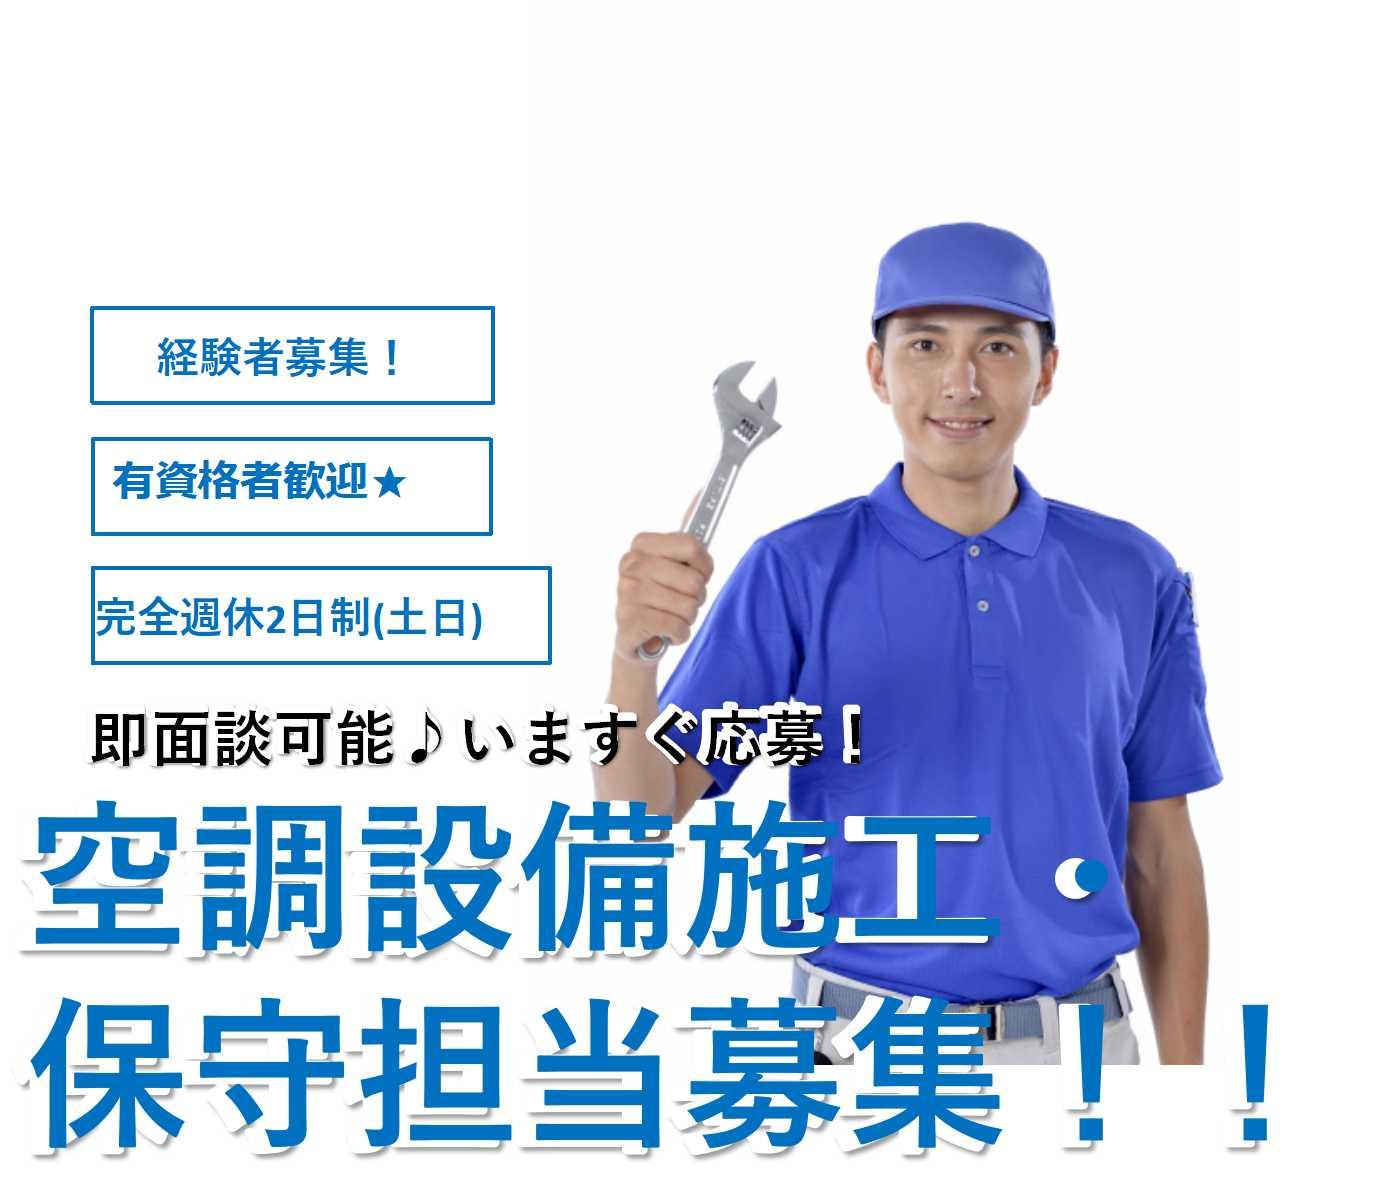 経験者募集!有資格者・PC操作できる方歓迎♪空調設備施工・保守【即面談可能】 イメージ